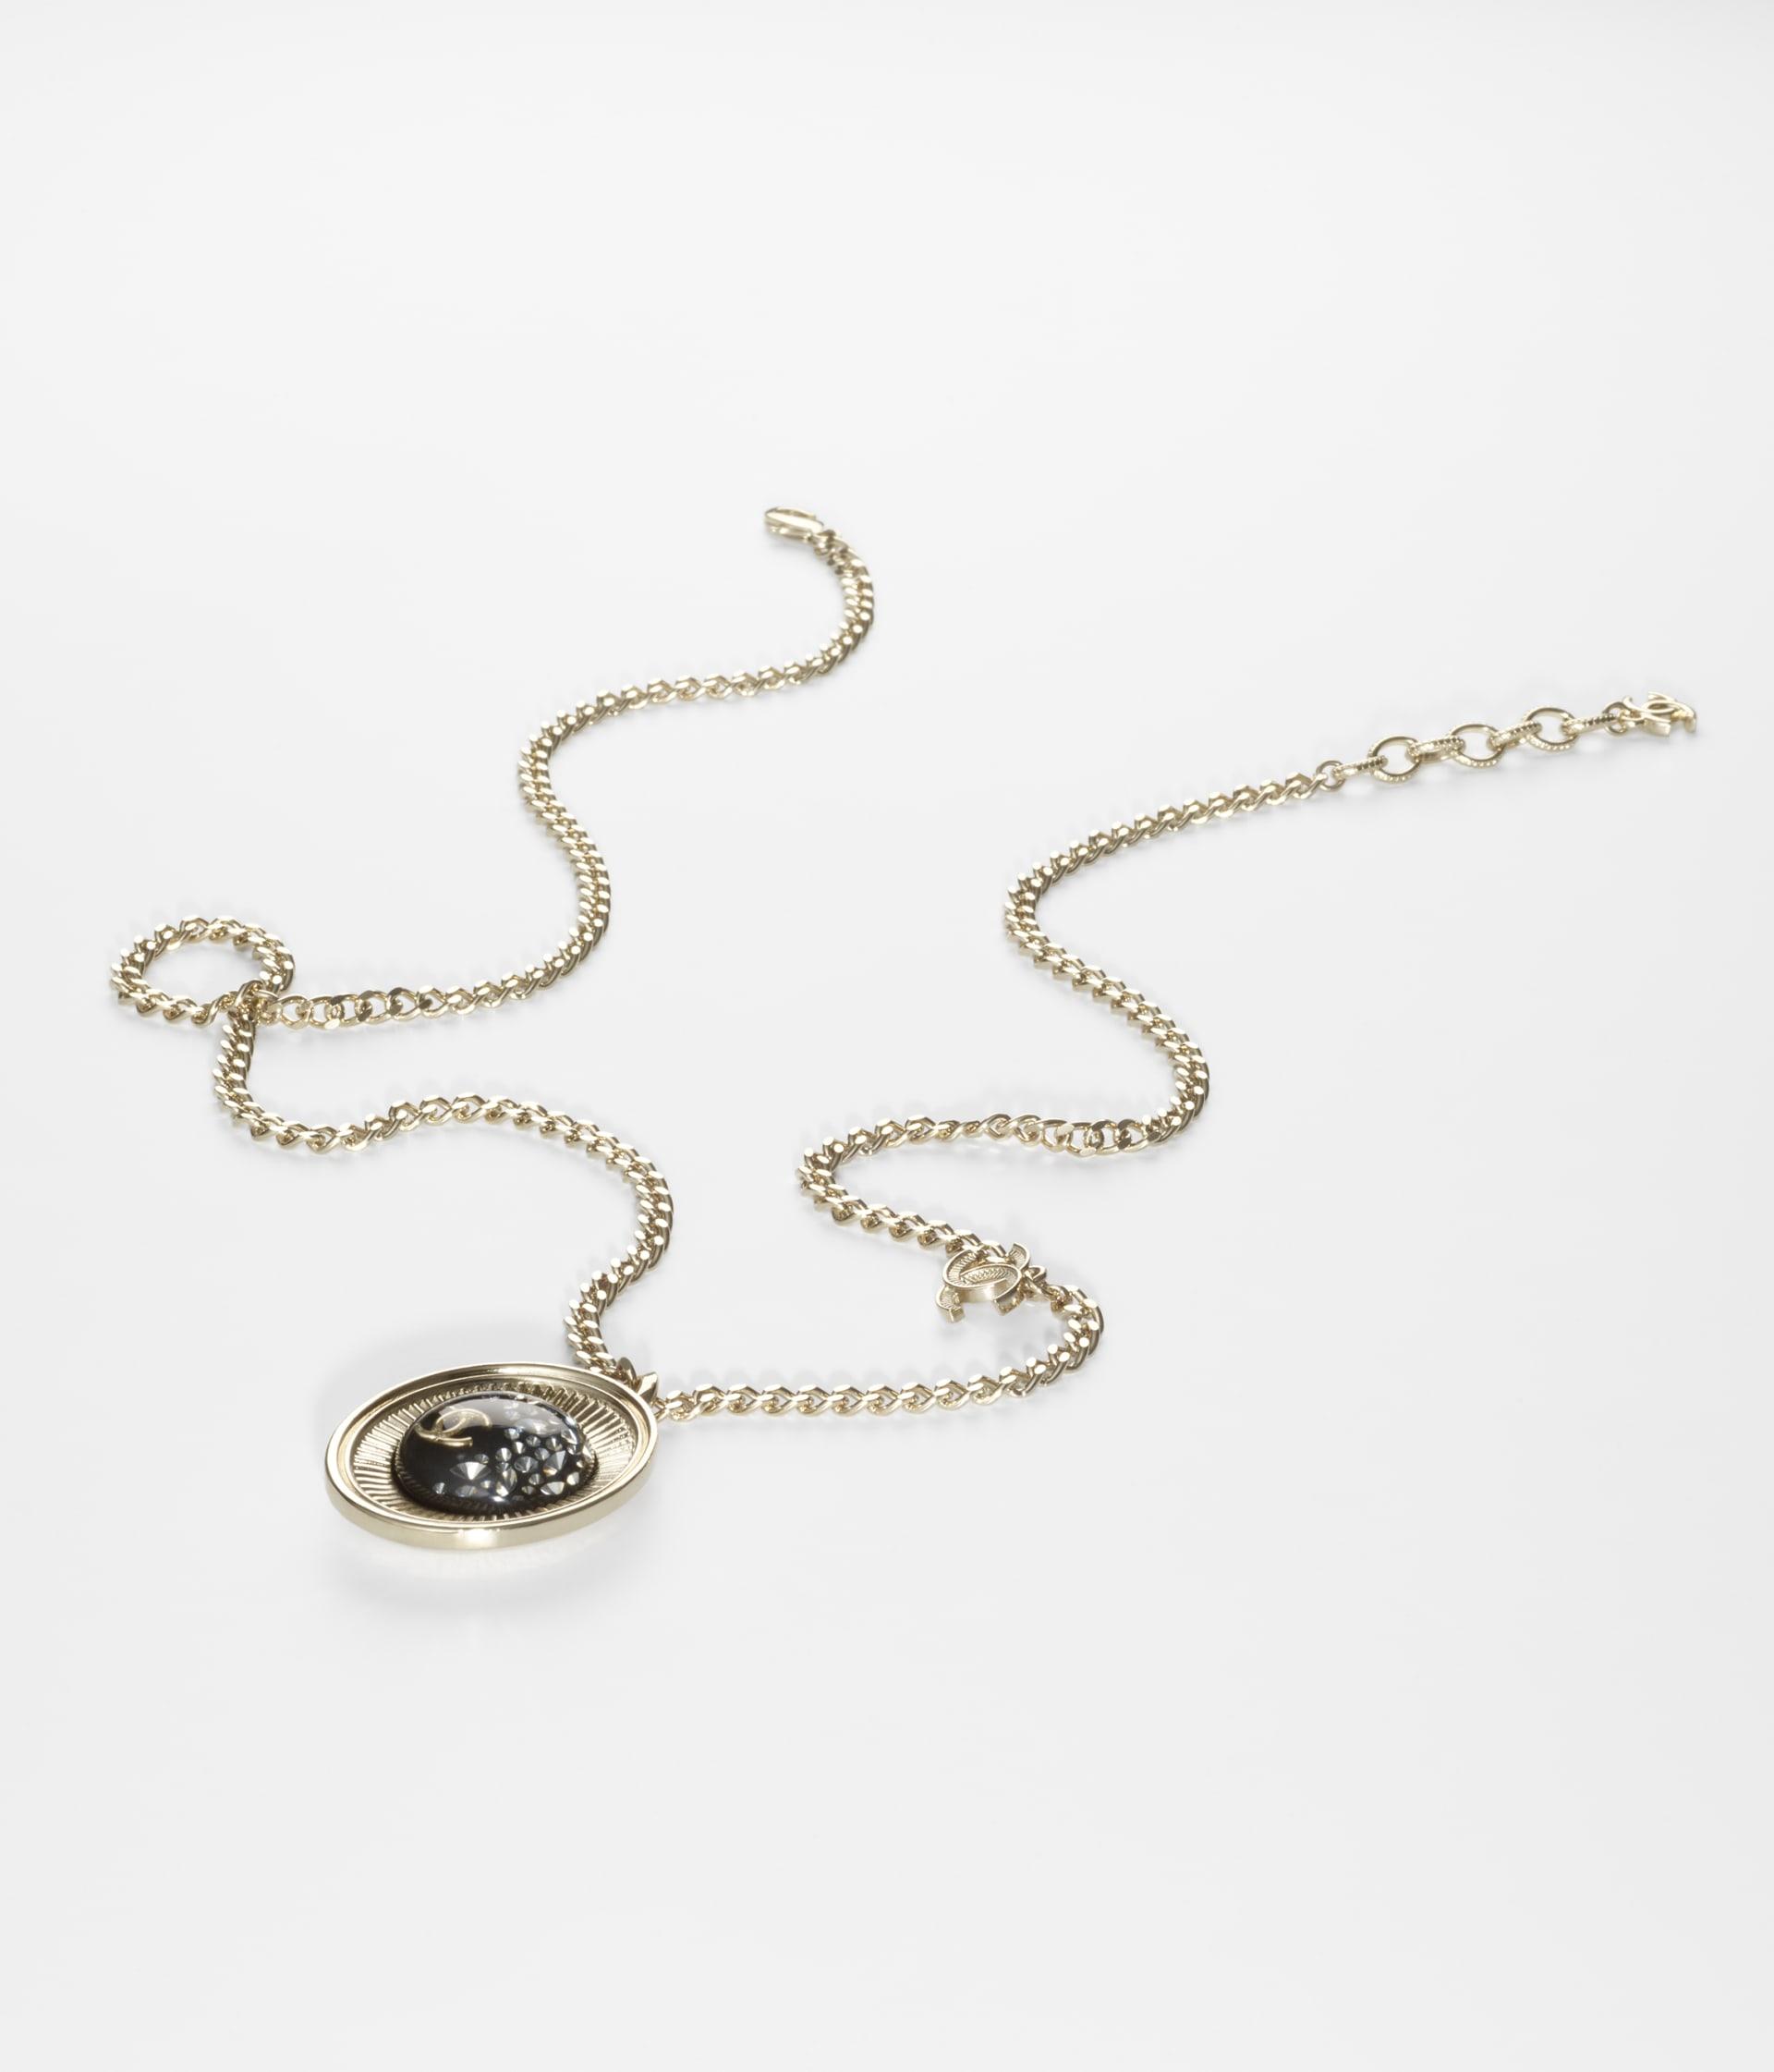 image 2 - Necklace - Metal, Resin & Strass - Gold, Black & Crystal